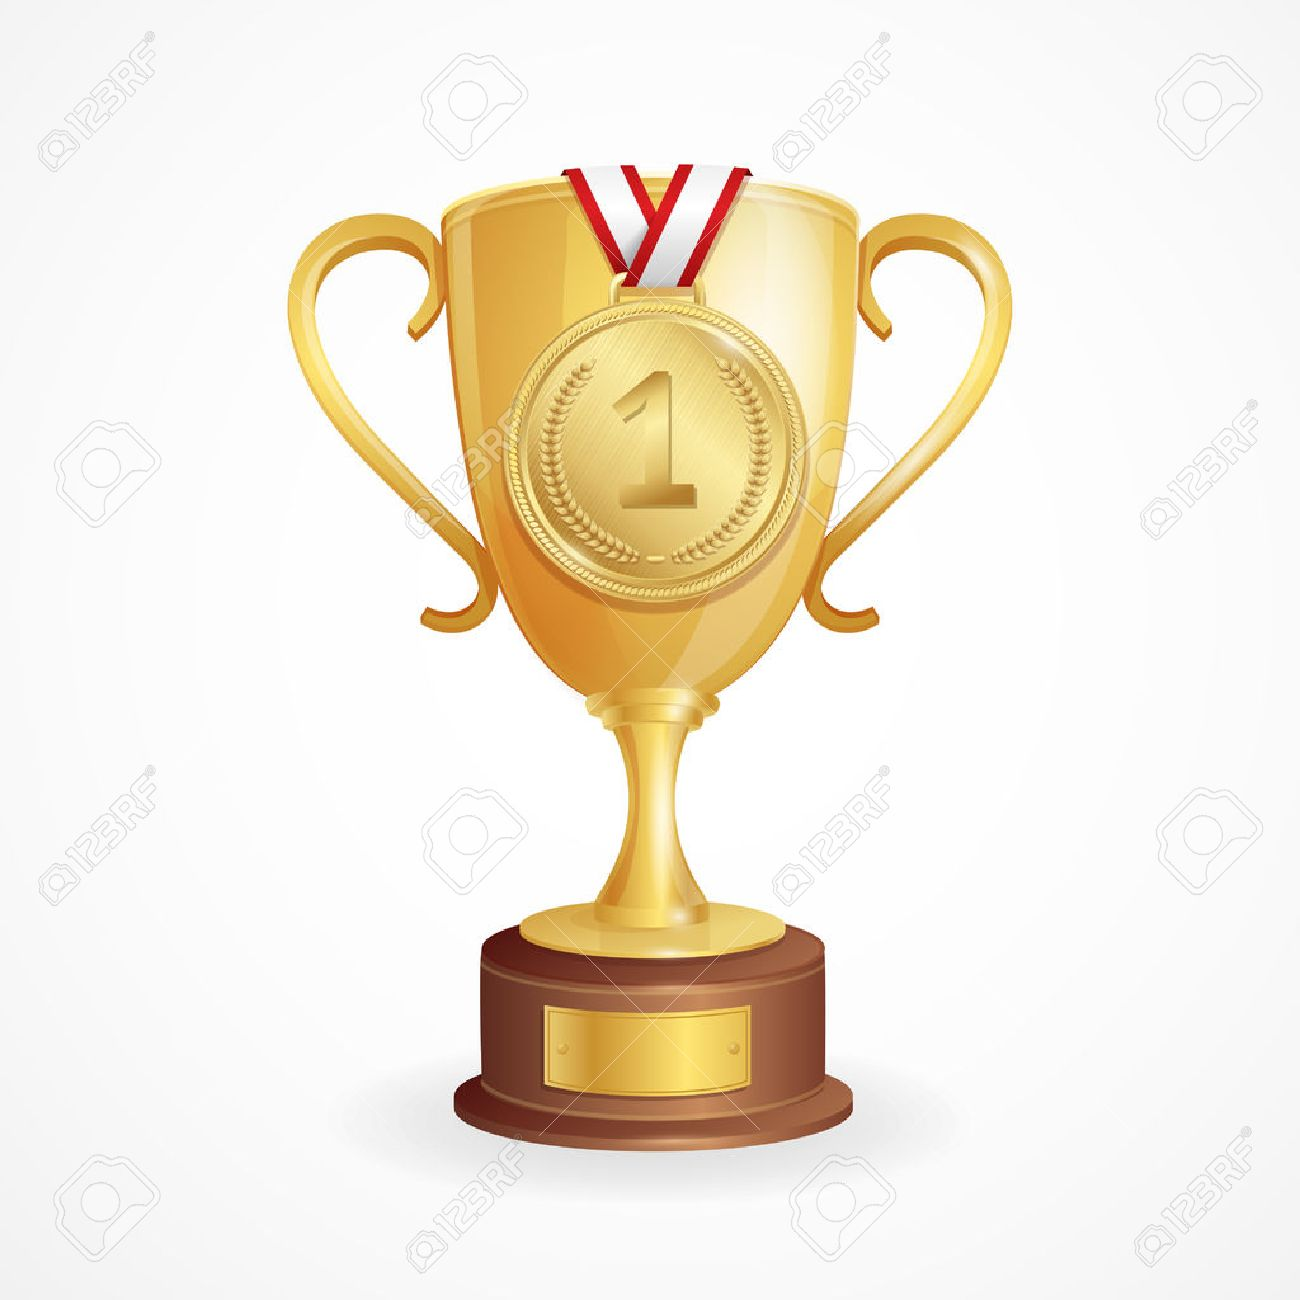 Winner Concept. Golden Cup and Medal. Vector illustration - 46552523